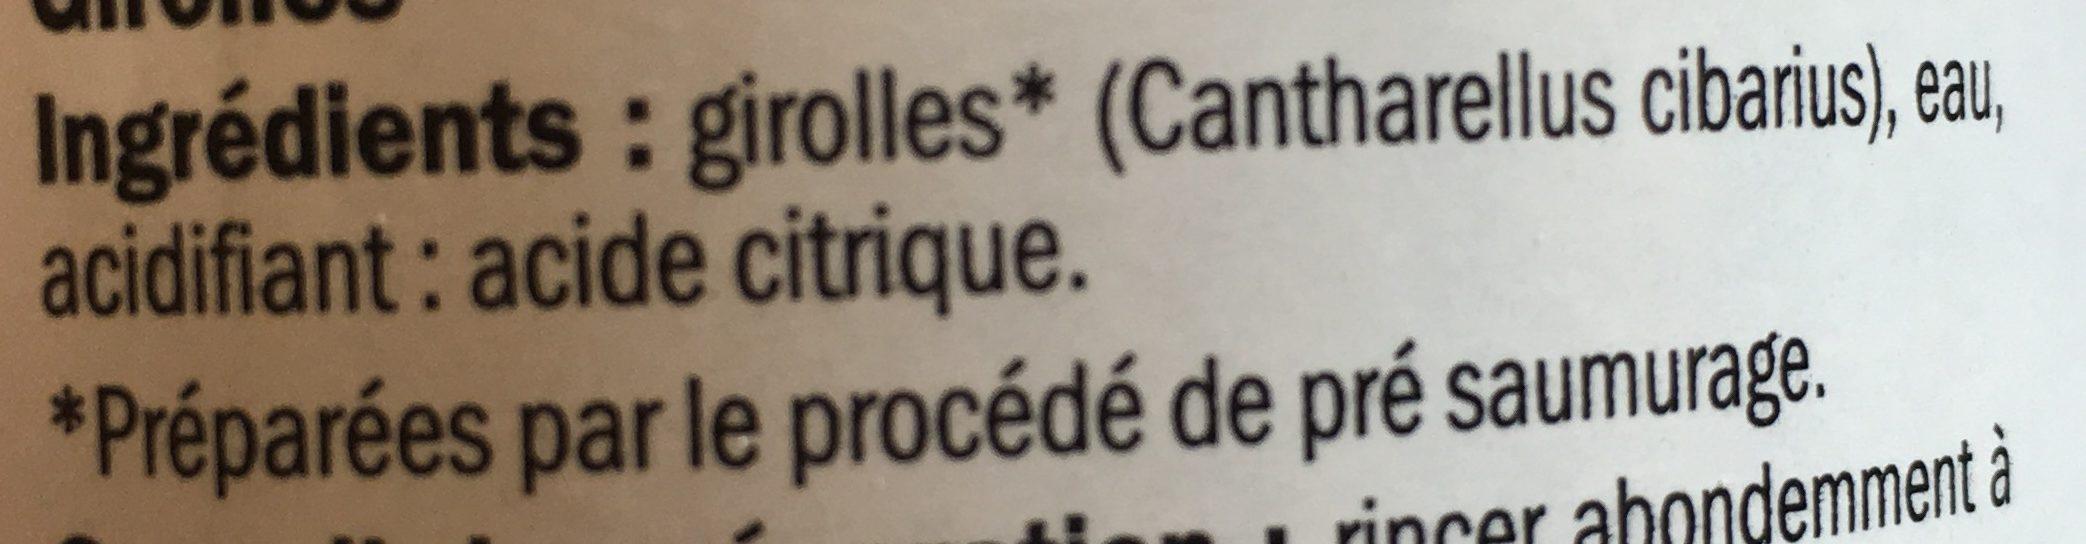 Girolles Deluxe Lidl - Ingrediënten - fr